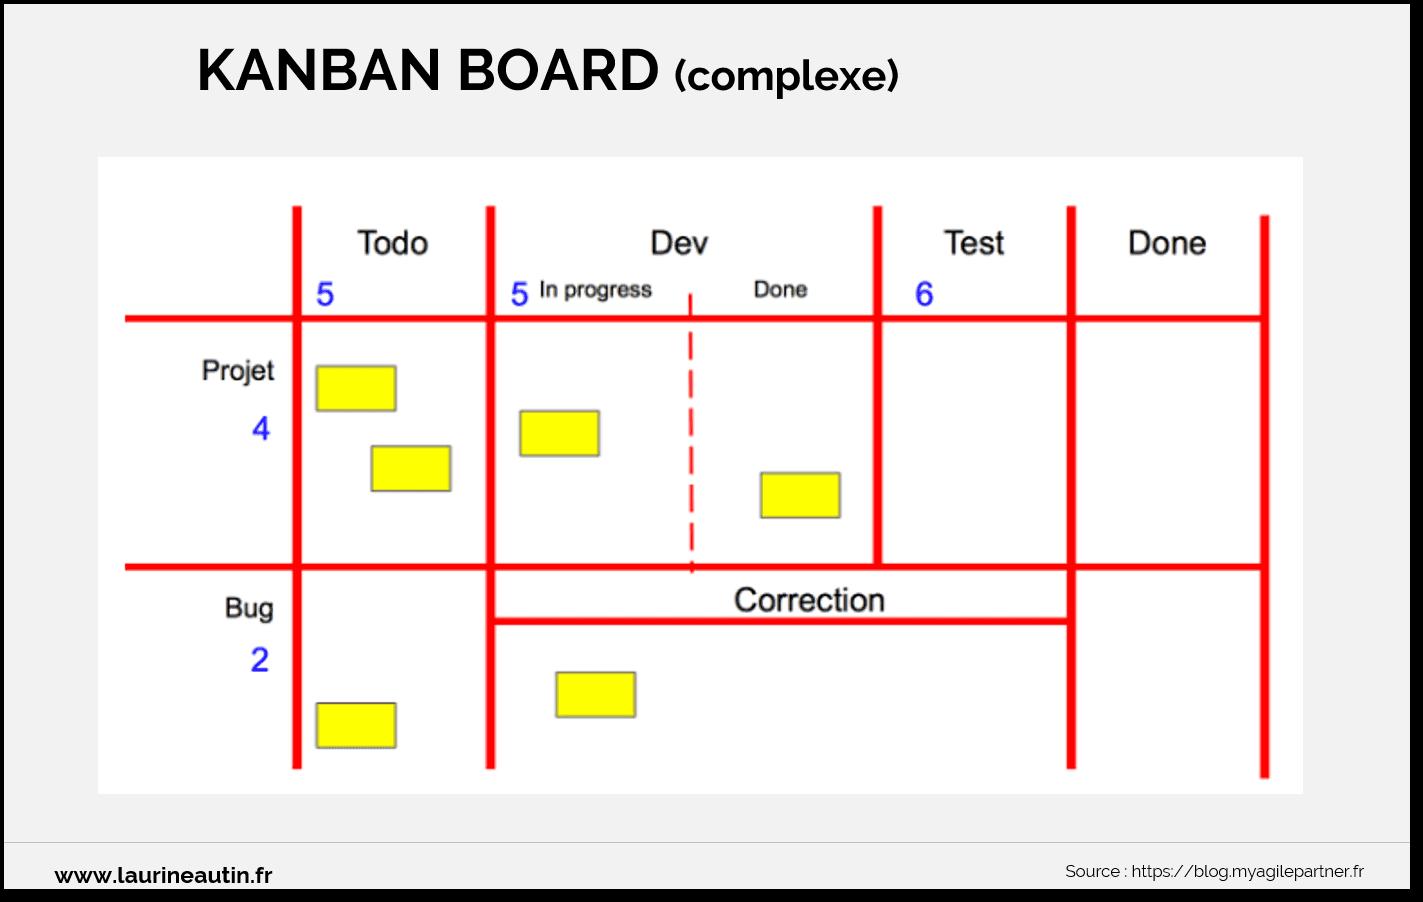 Kanban Board complexe